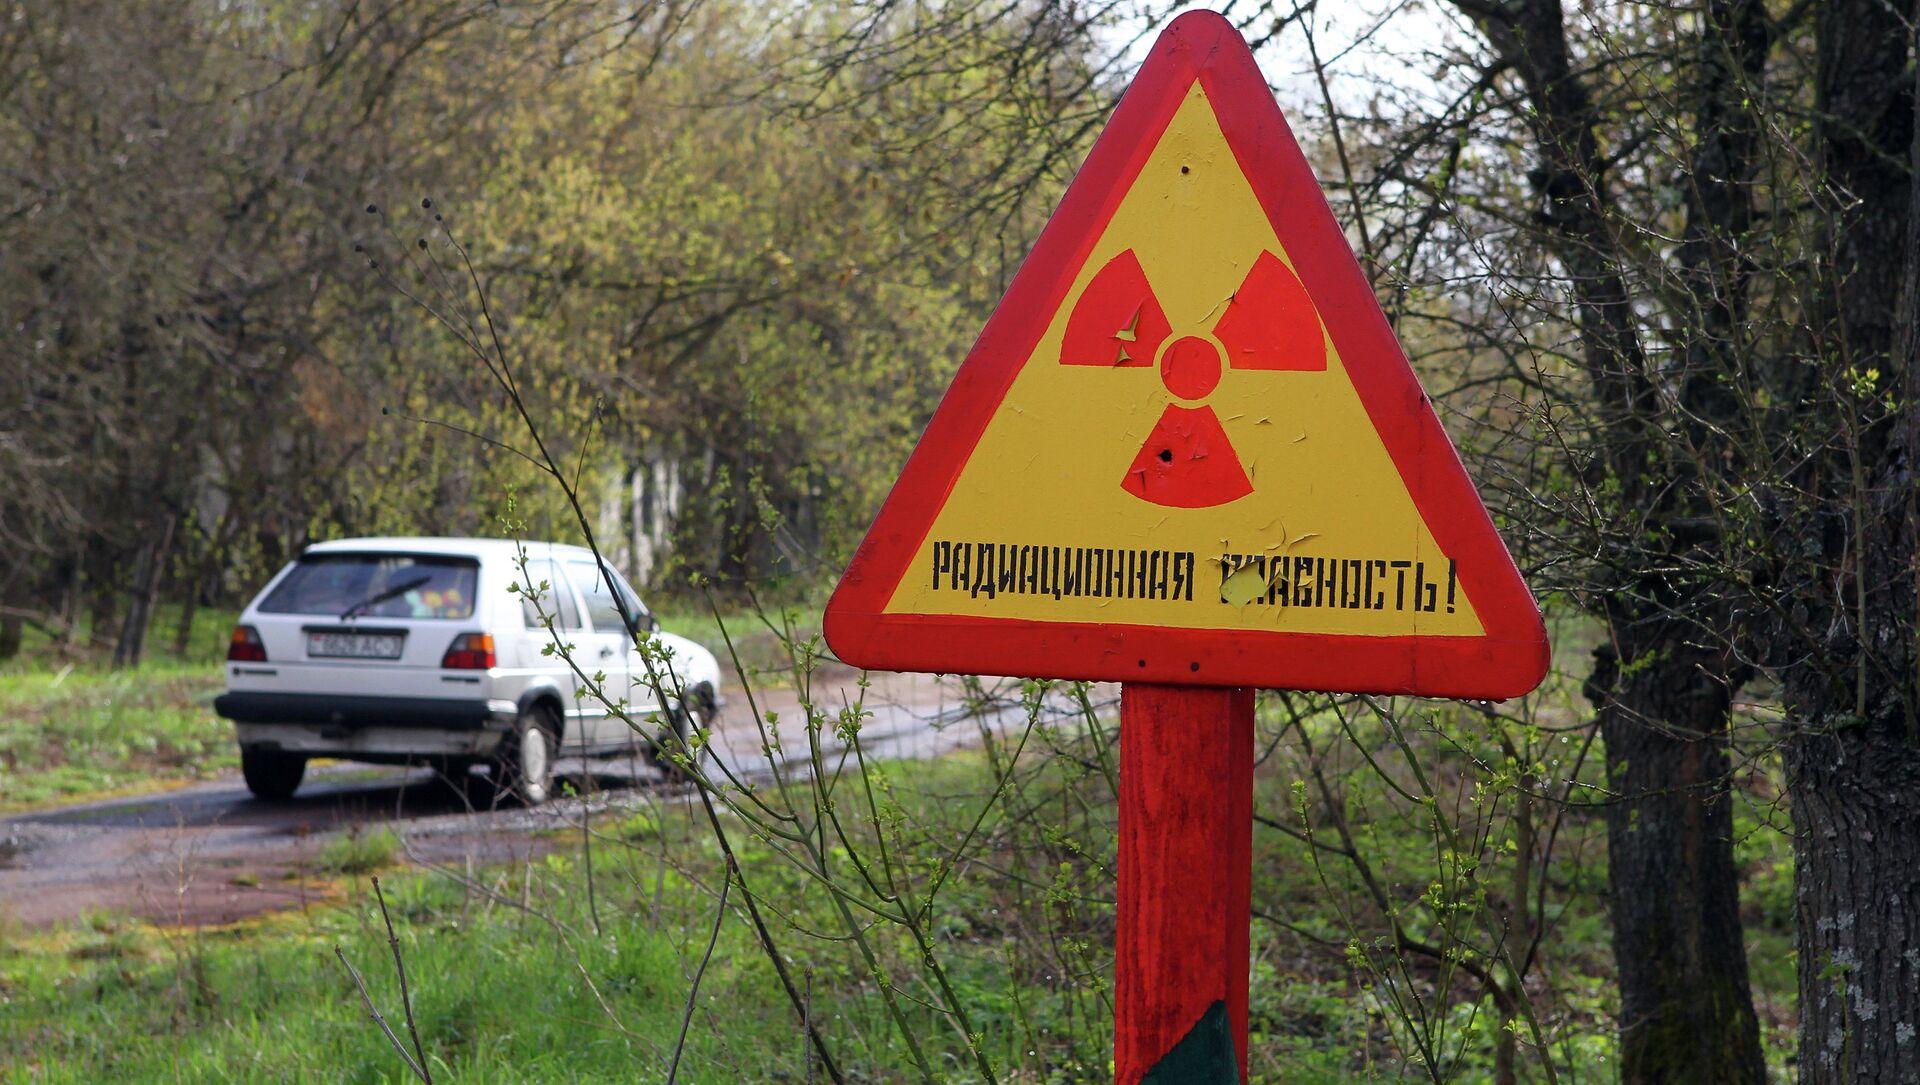 Zona de exclusión alrededor del reactor nuclear de Chernóbil - Sputnik Mundo, 1920, 11.12.2019